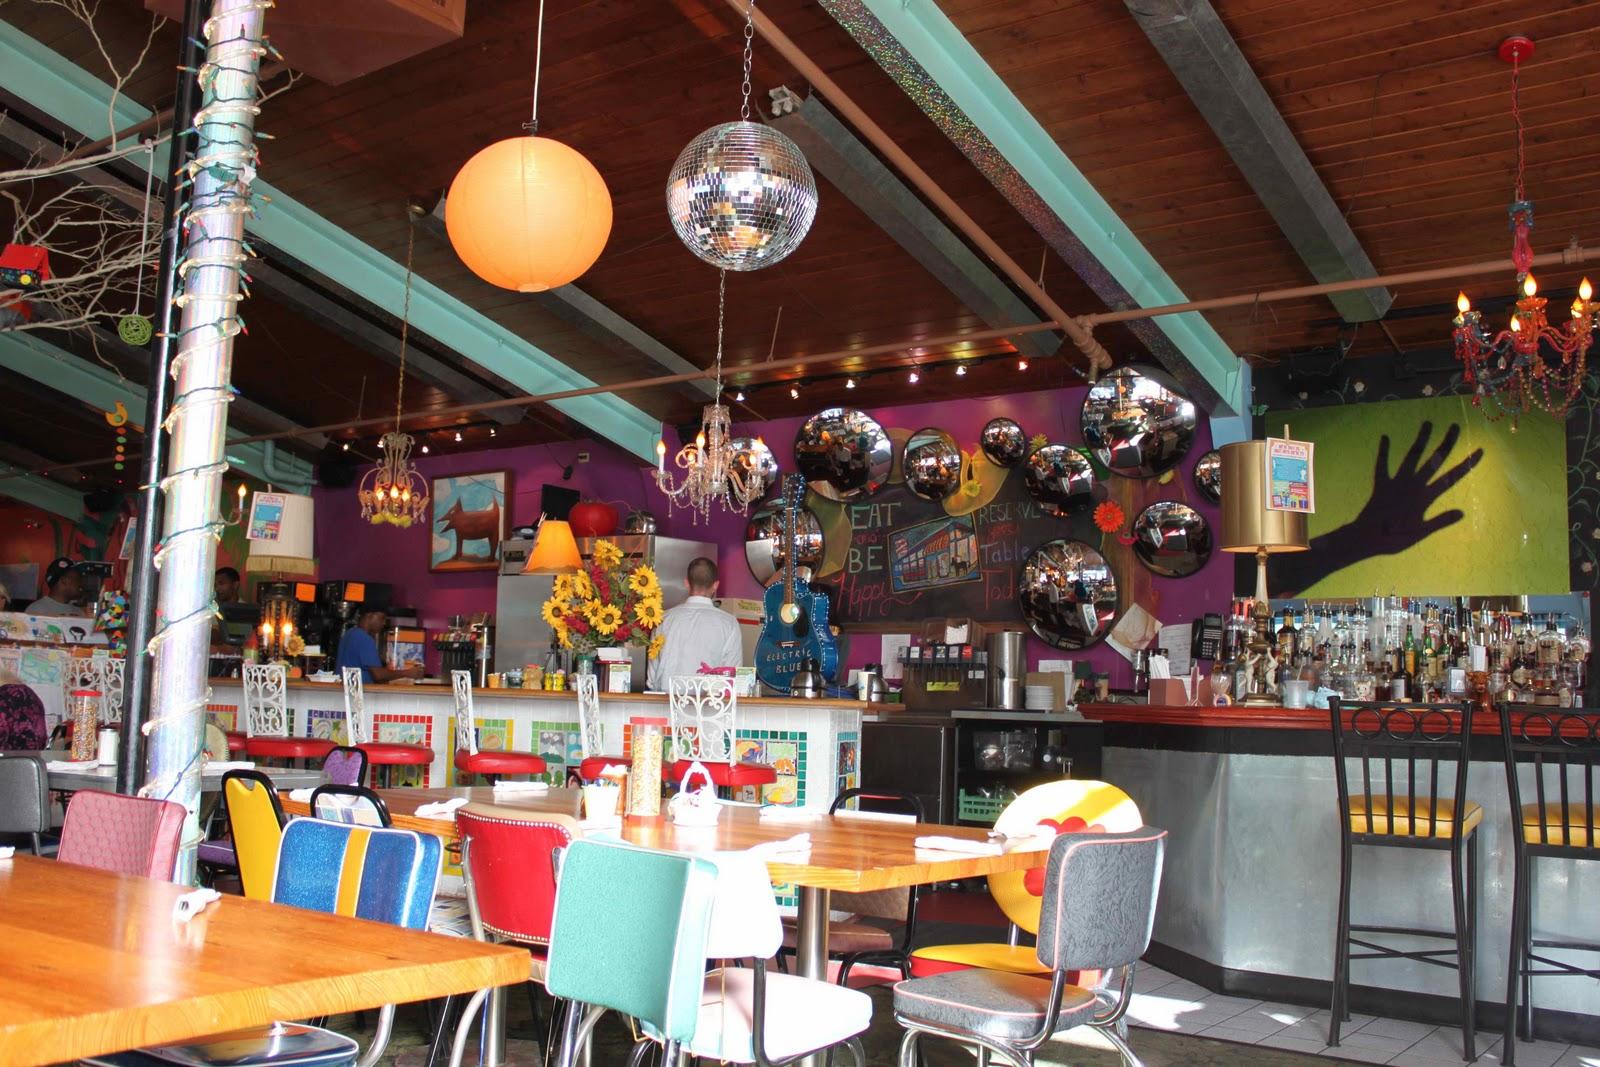 ... - The Year Round Veggie Gardener: Lynn's Paradise Cafe in Louisville